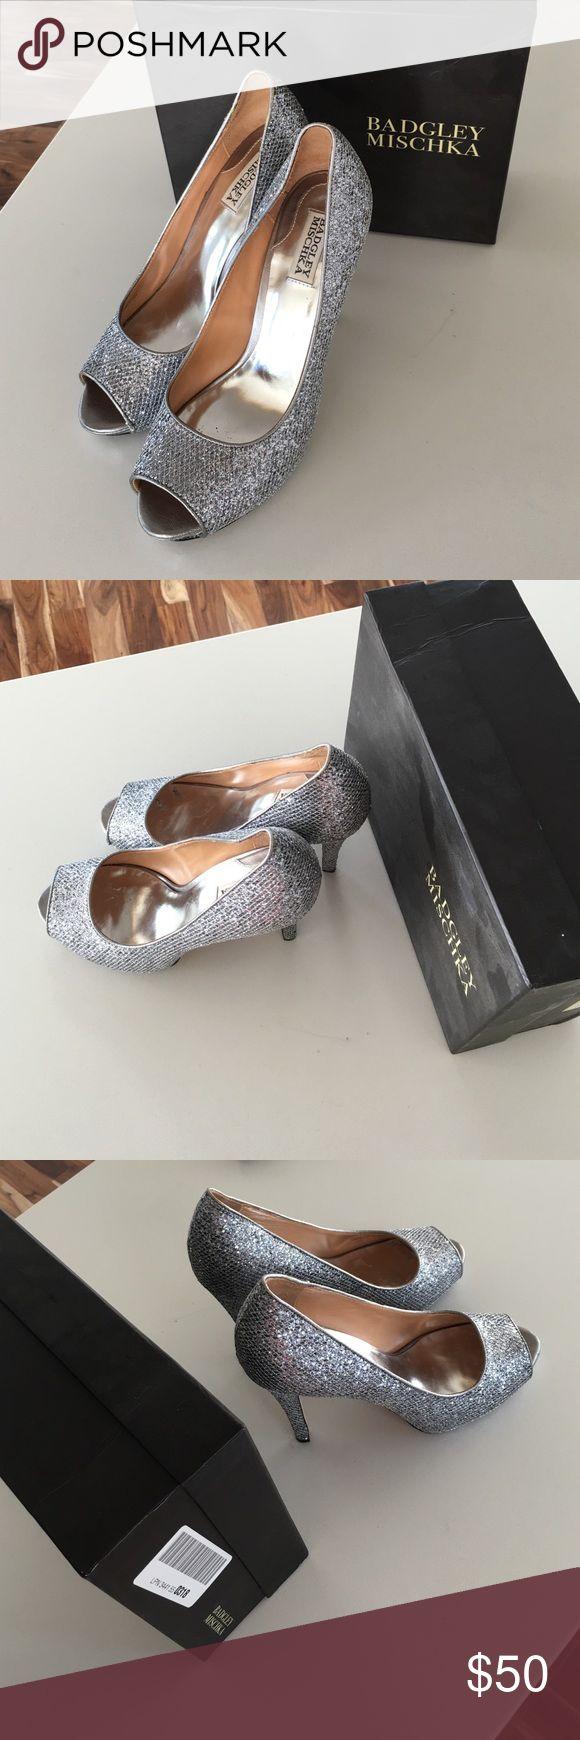 100% Authentic Bagley Mischka sparkly 4 in heels 100% Authentic Bagley Mischka sparkly 4 in heels, like new, worn once, GREAT condition Bagley Mischka Shoes Heels